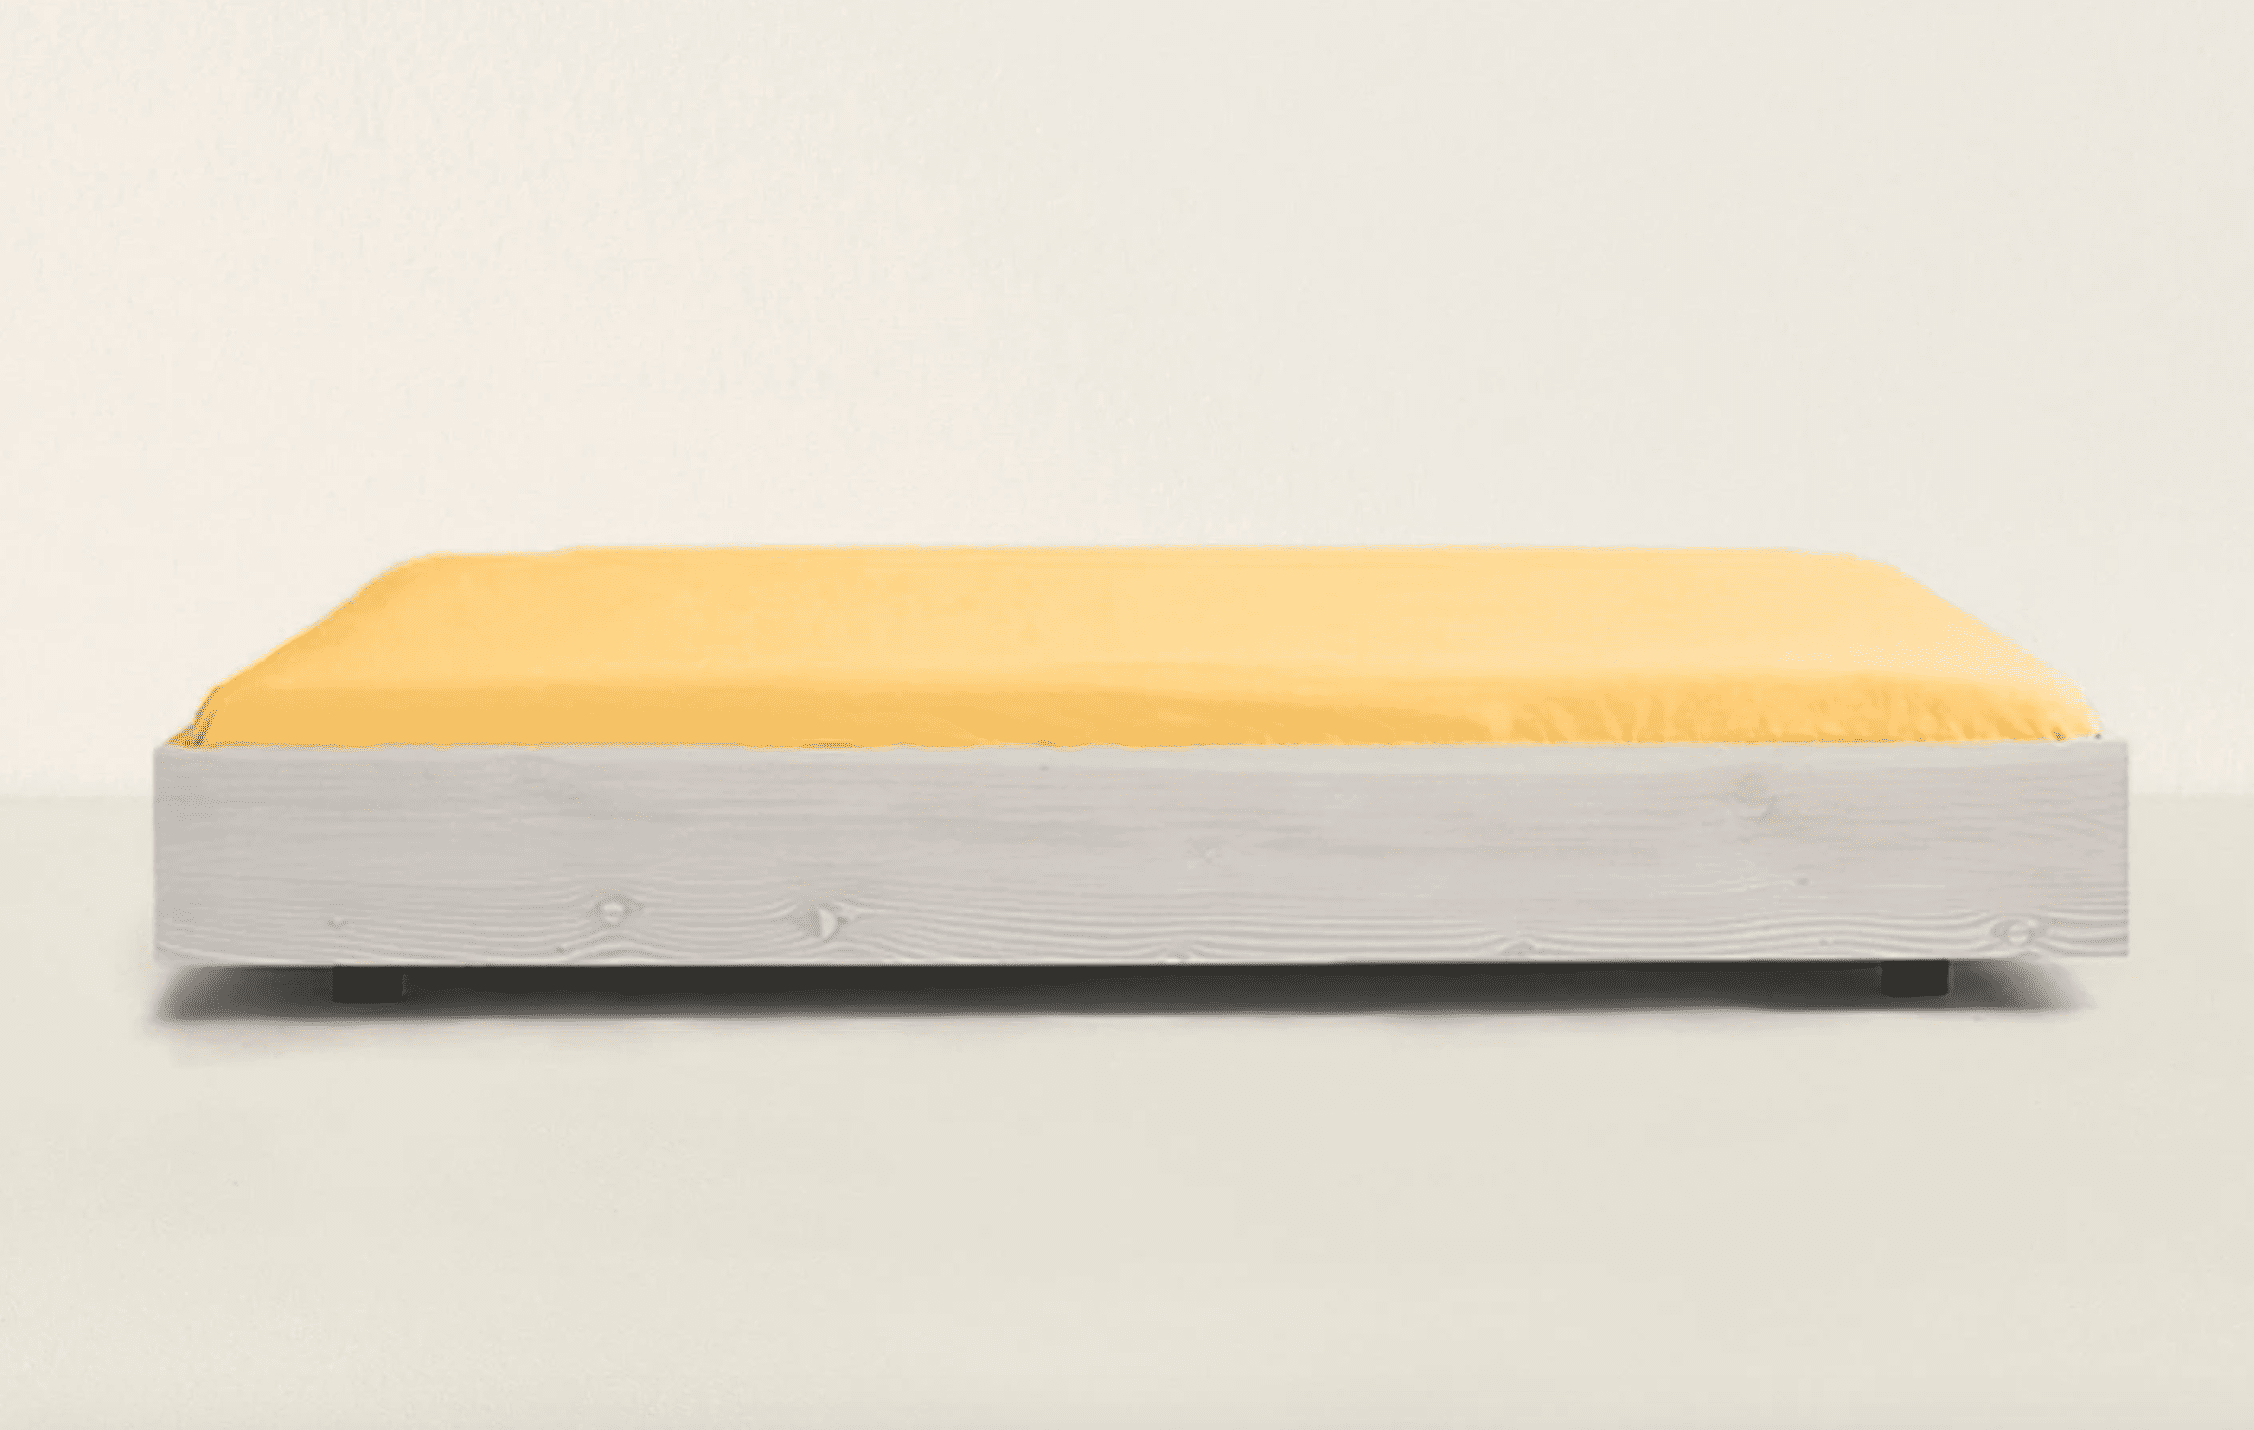 Goodee - Tekla Percale Flat Sheet